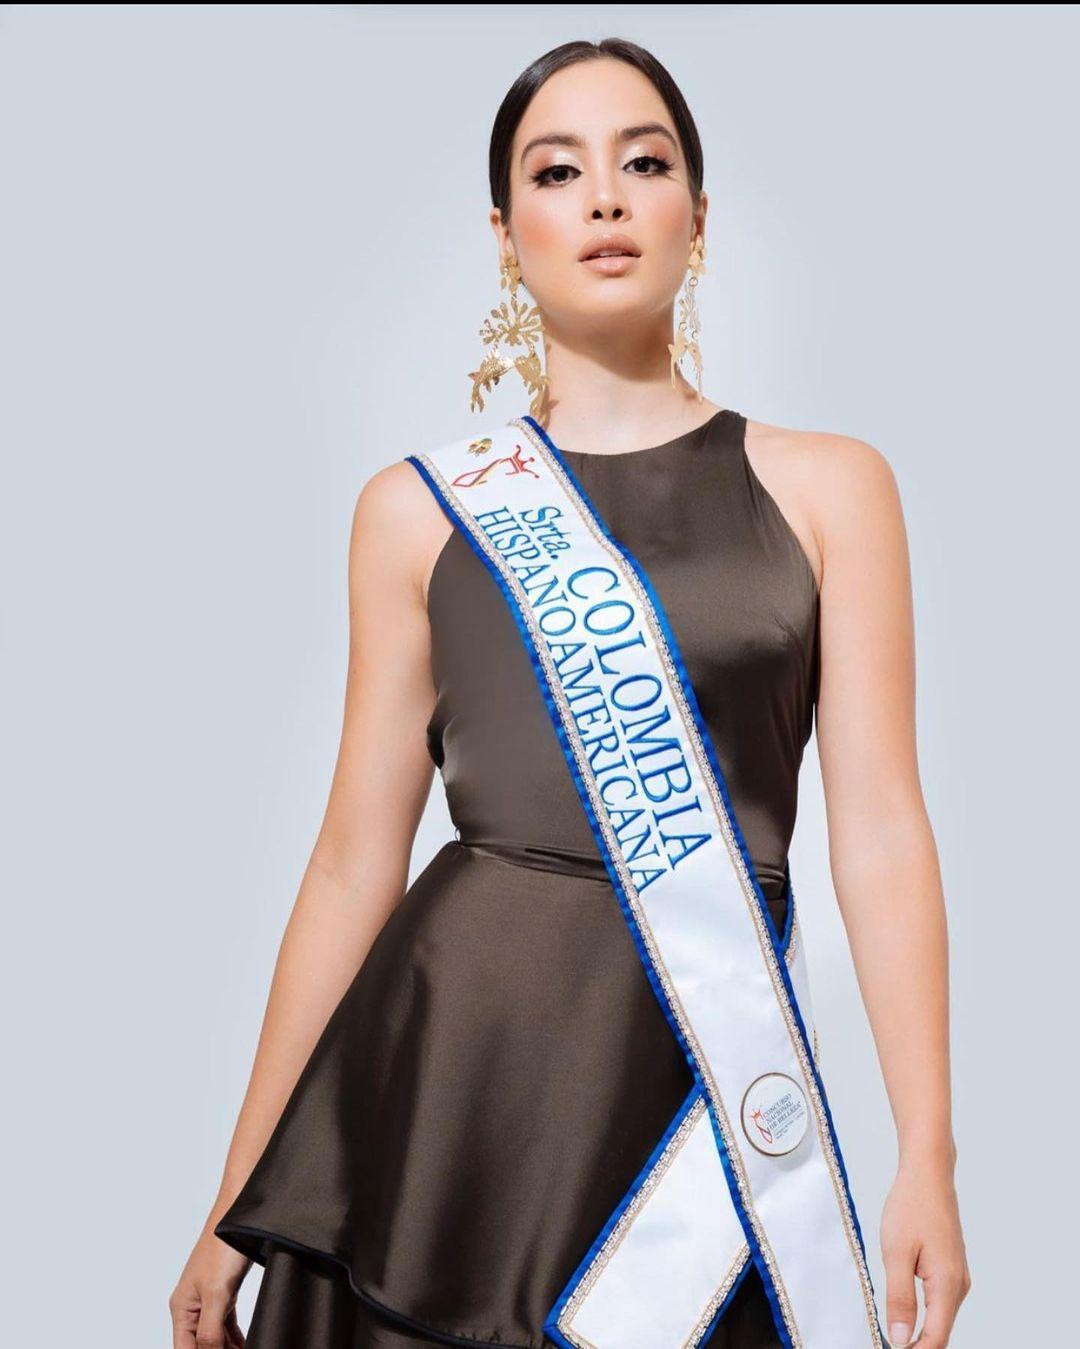 maria alejandra vengoechea, miss colombia hispanoamericana 2021/3rd runner-up de miss international 2019. - Página 14 23480210